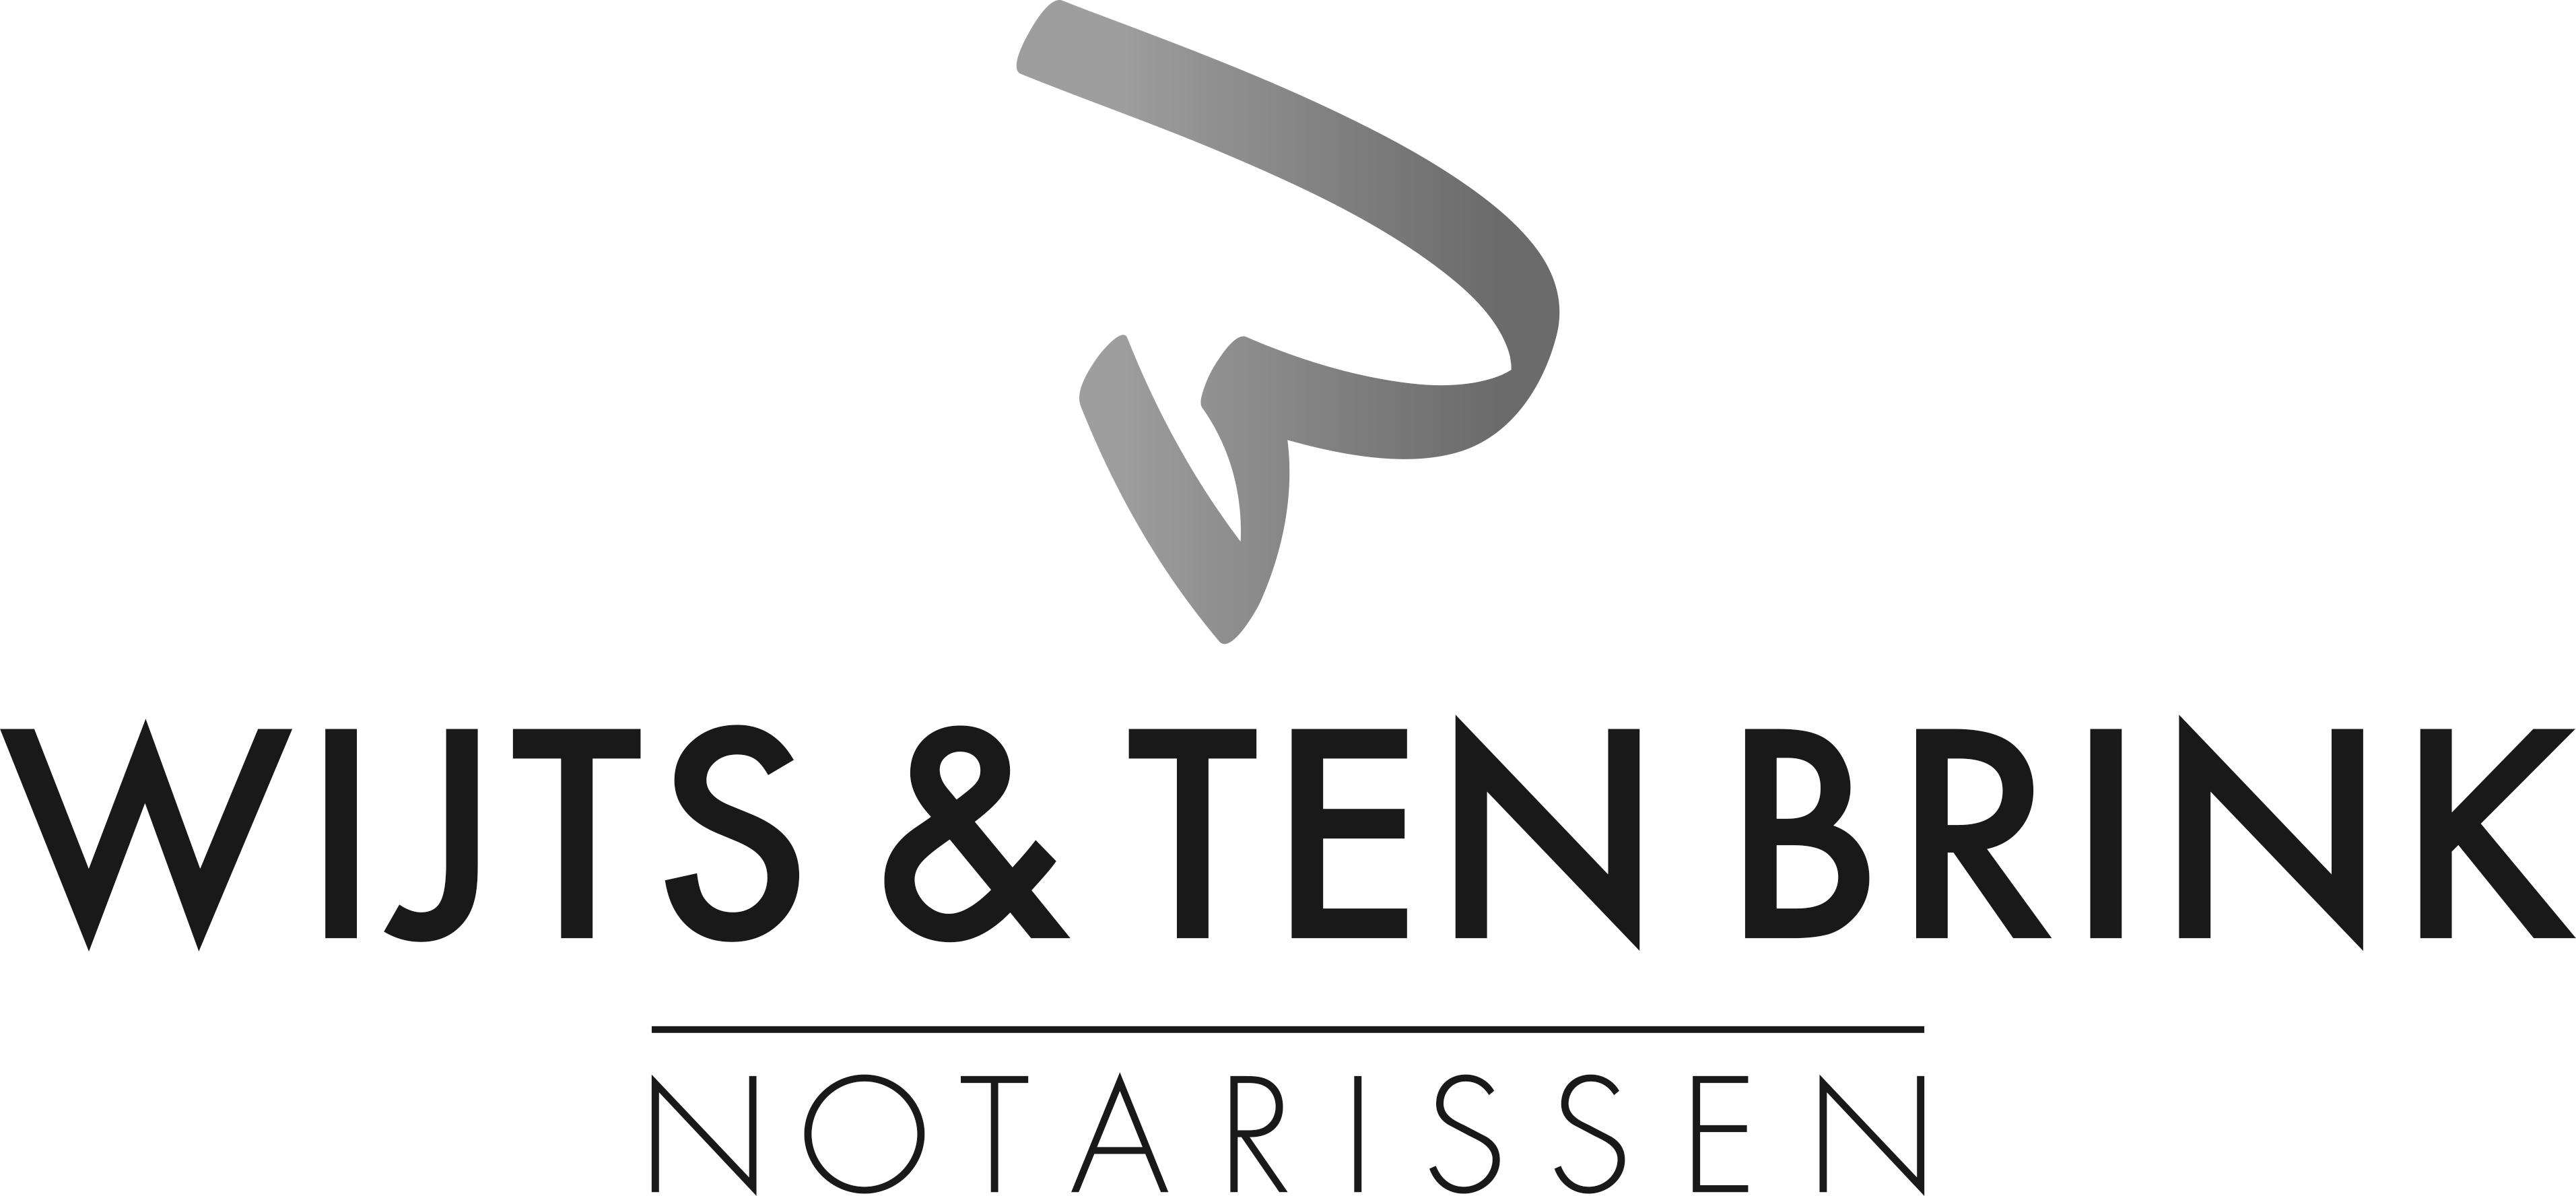 Logo Wijts & Ten Brink Notarissen